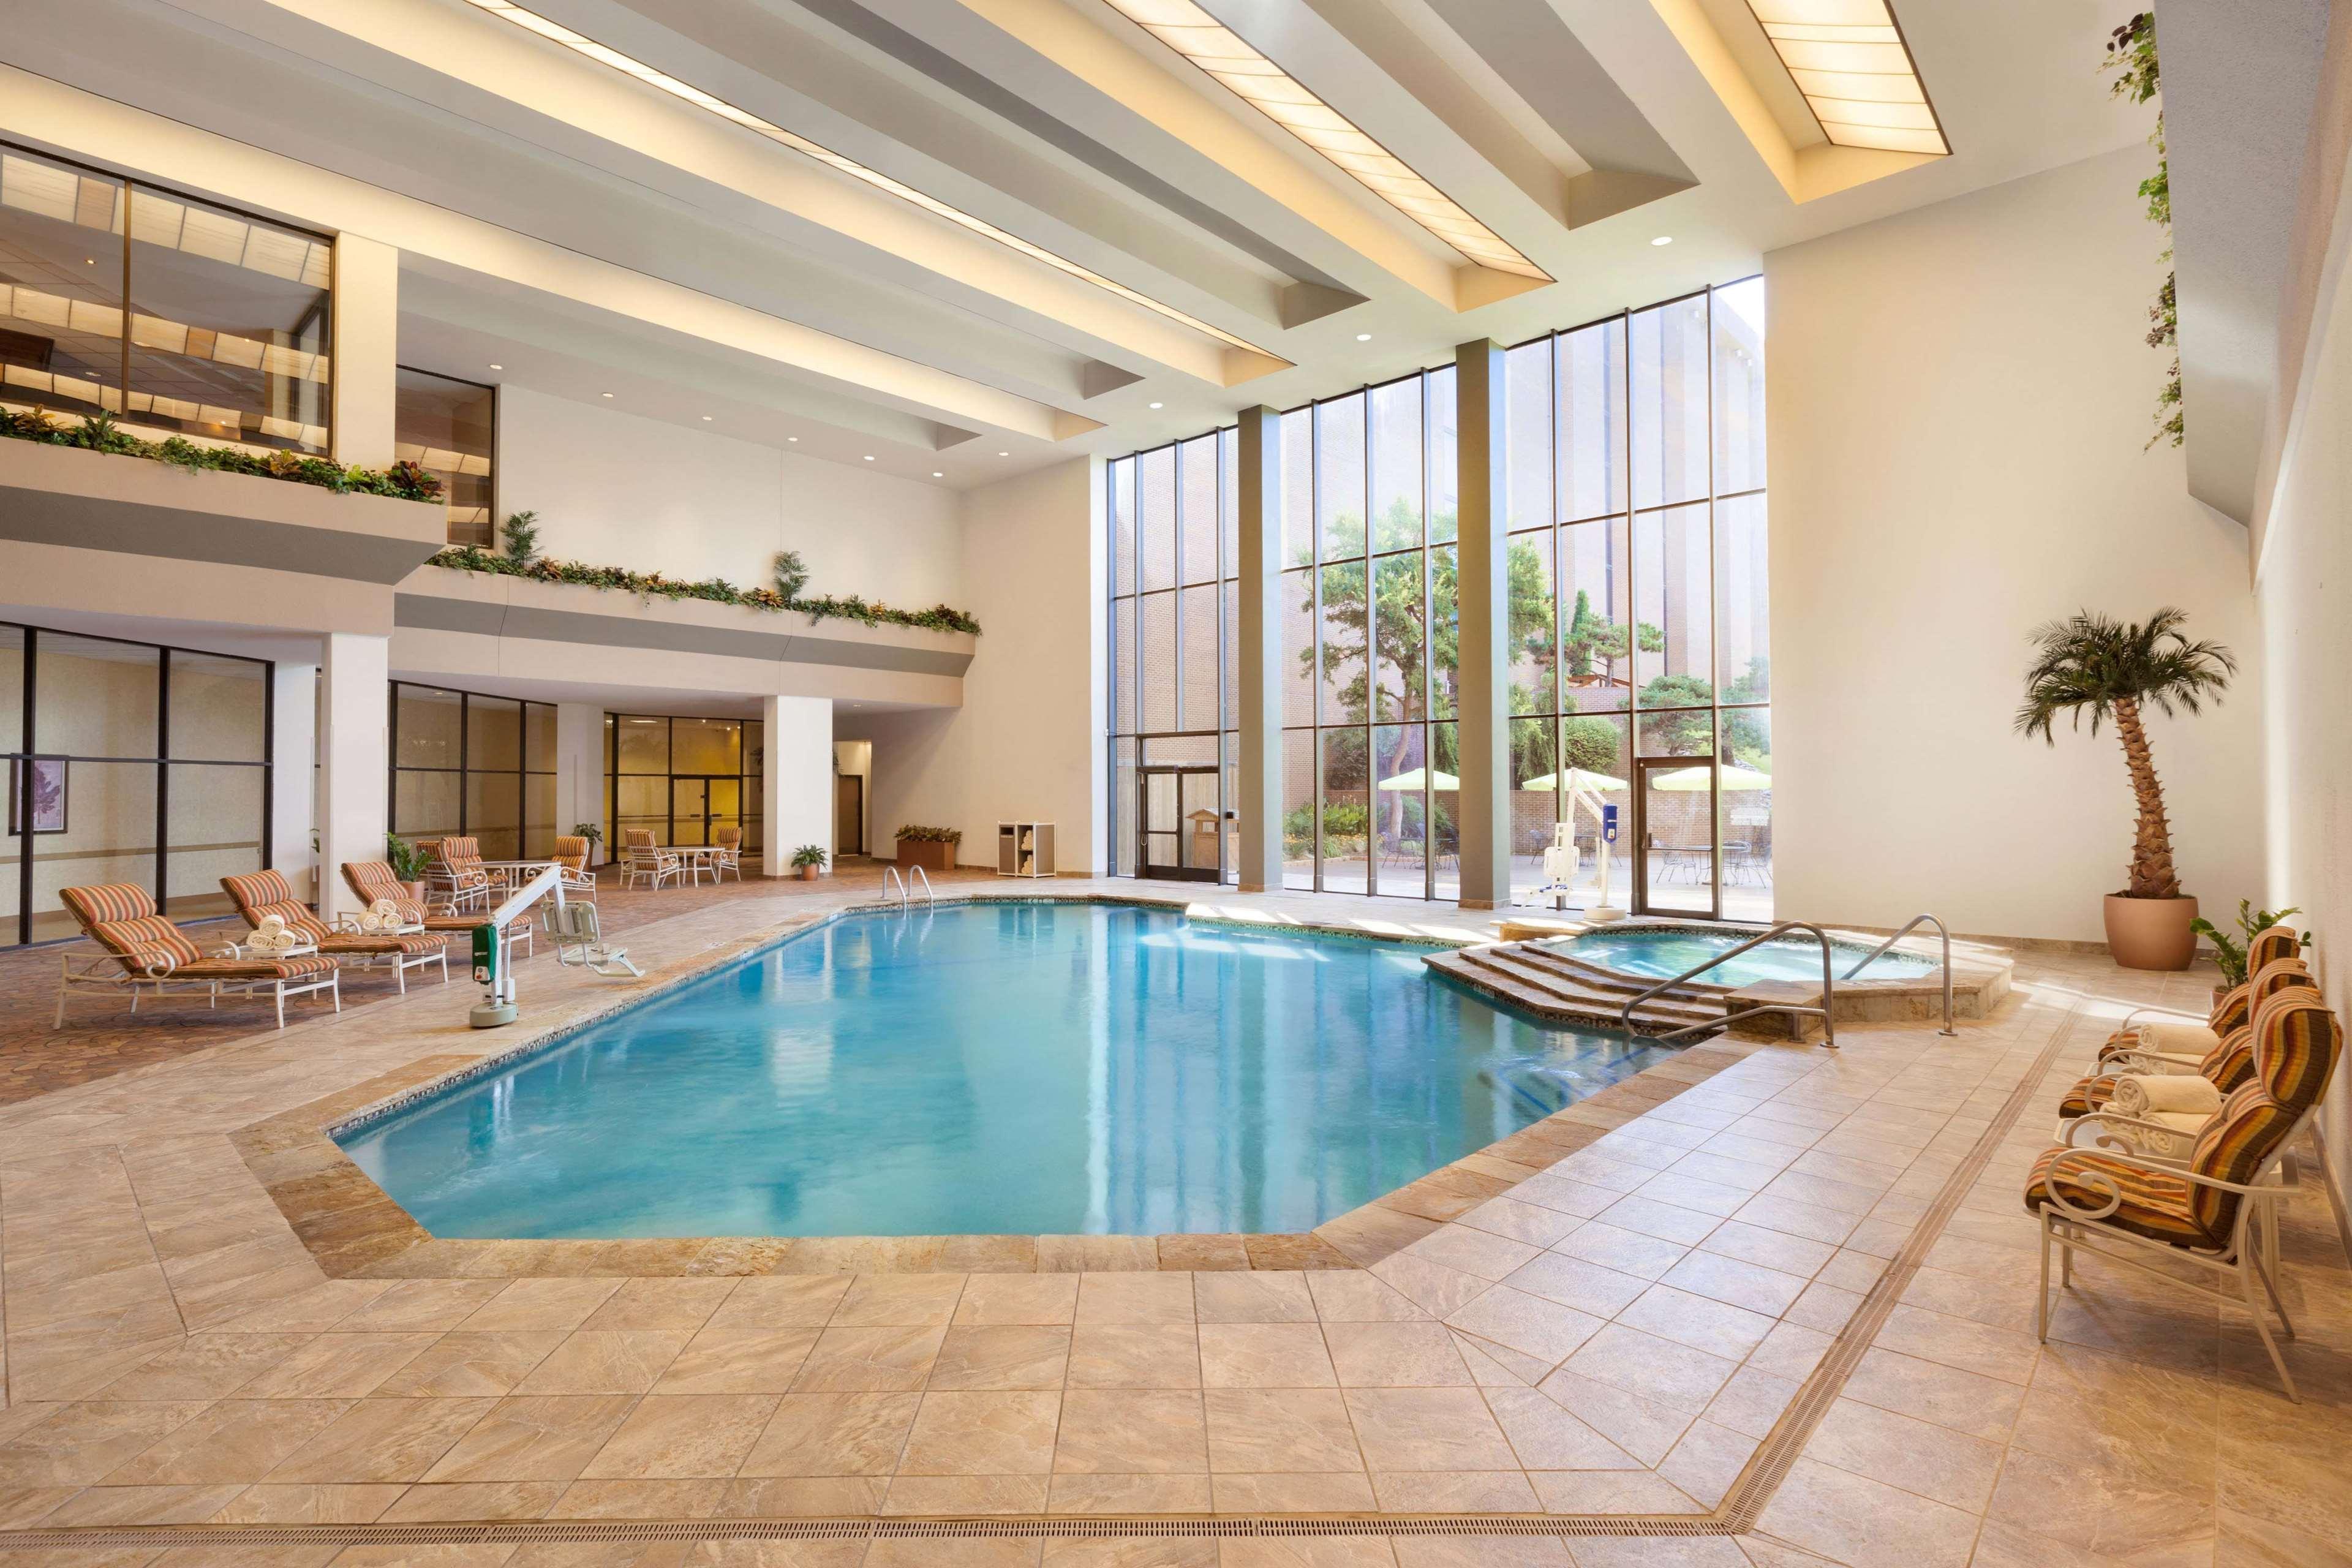 Hilton DFW Lakes Executive Conference Center image 8